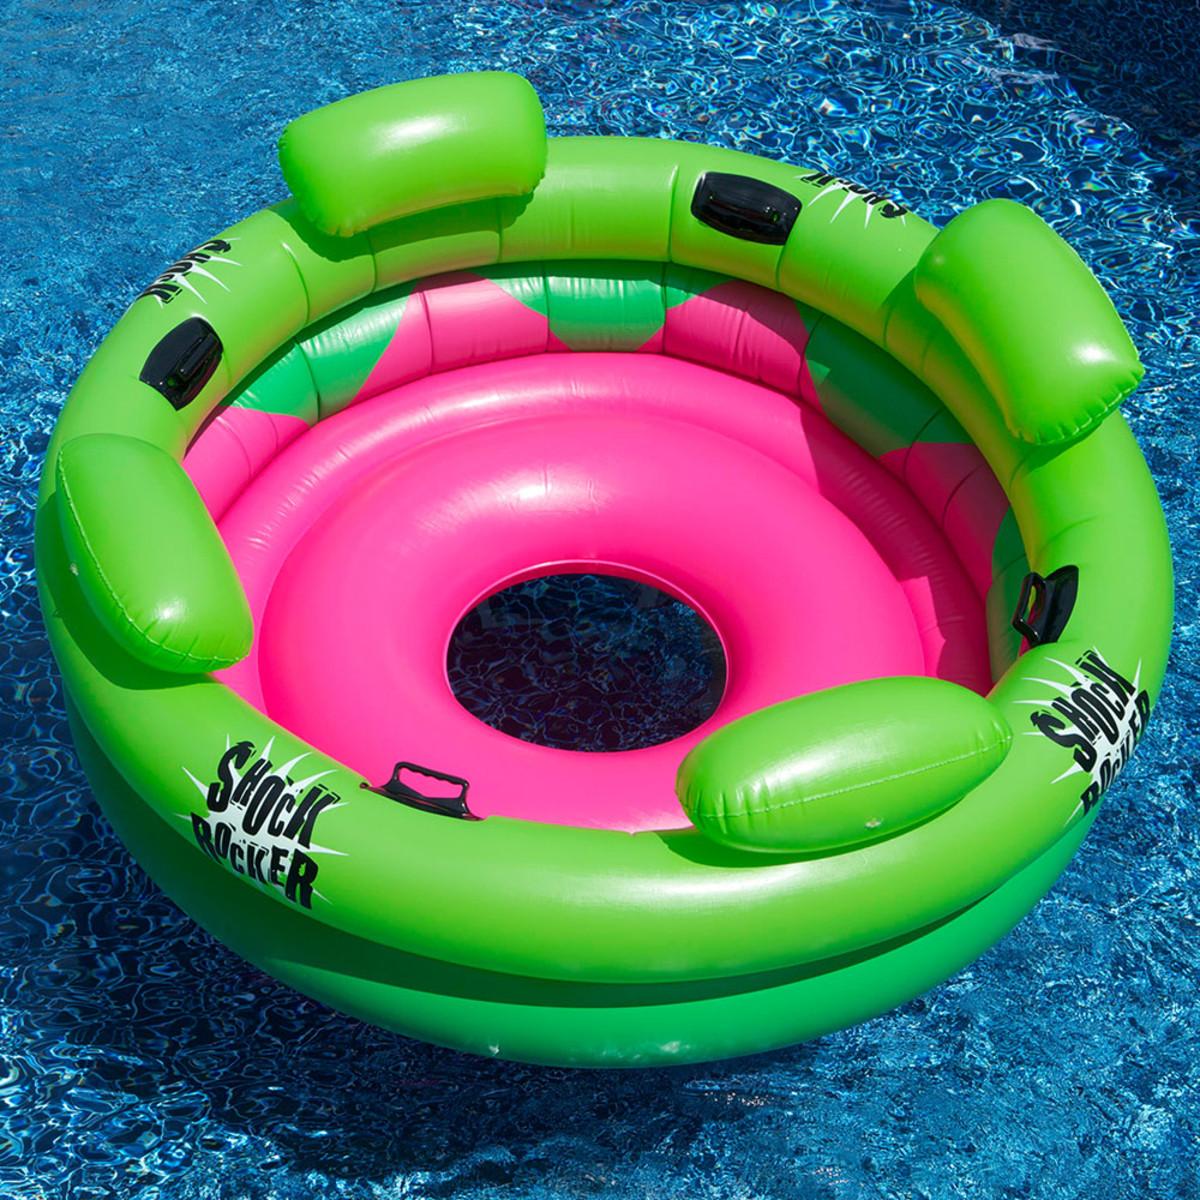 Swimline Shock Rocker Kids Floats Pools Splash Super Center